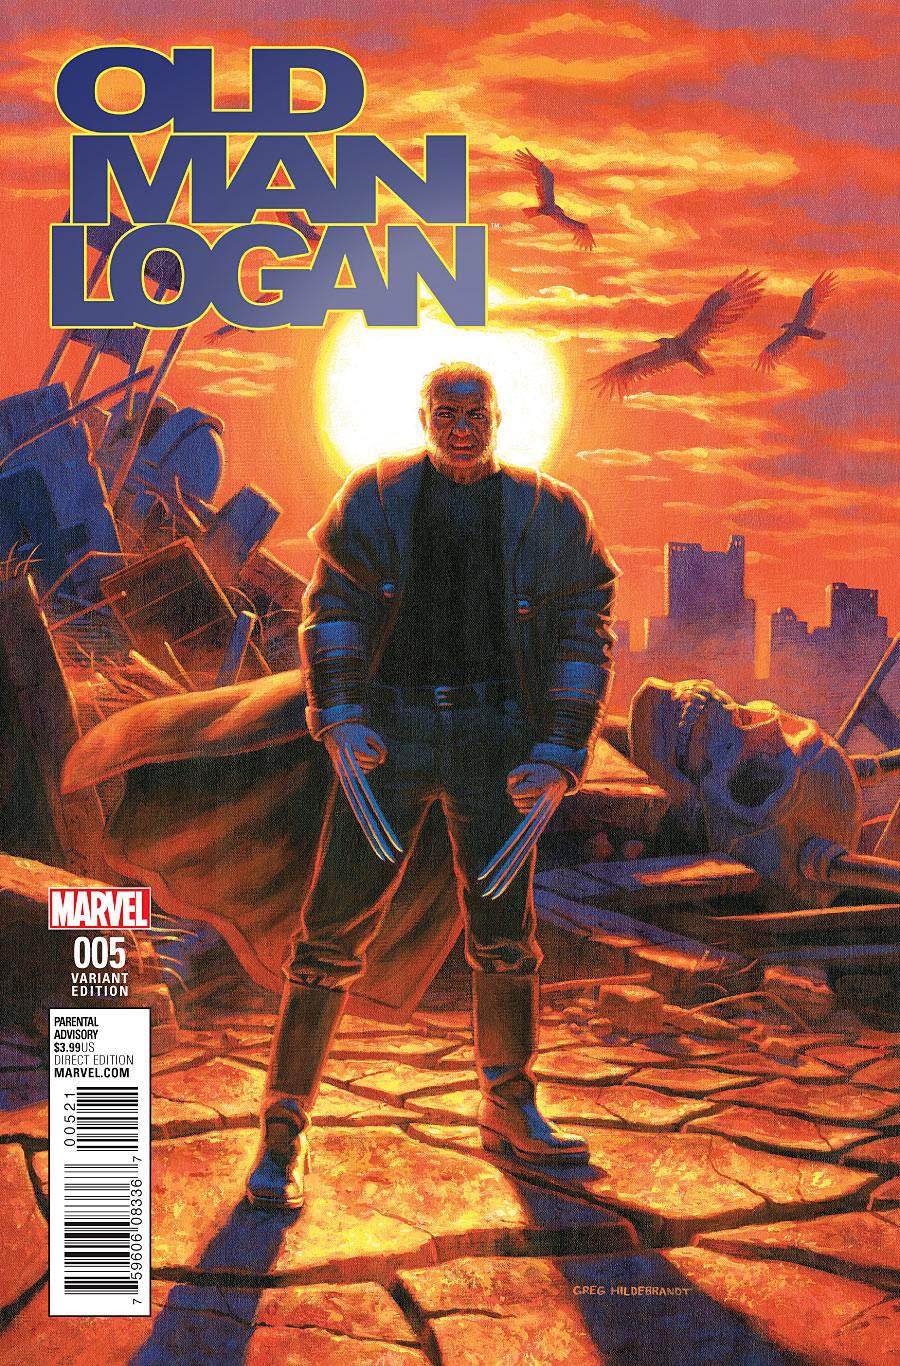 Old Man Logan Vol 2 #5 Cover C Incentive Greg Hildebrandt Classic Variant Cover